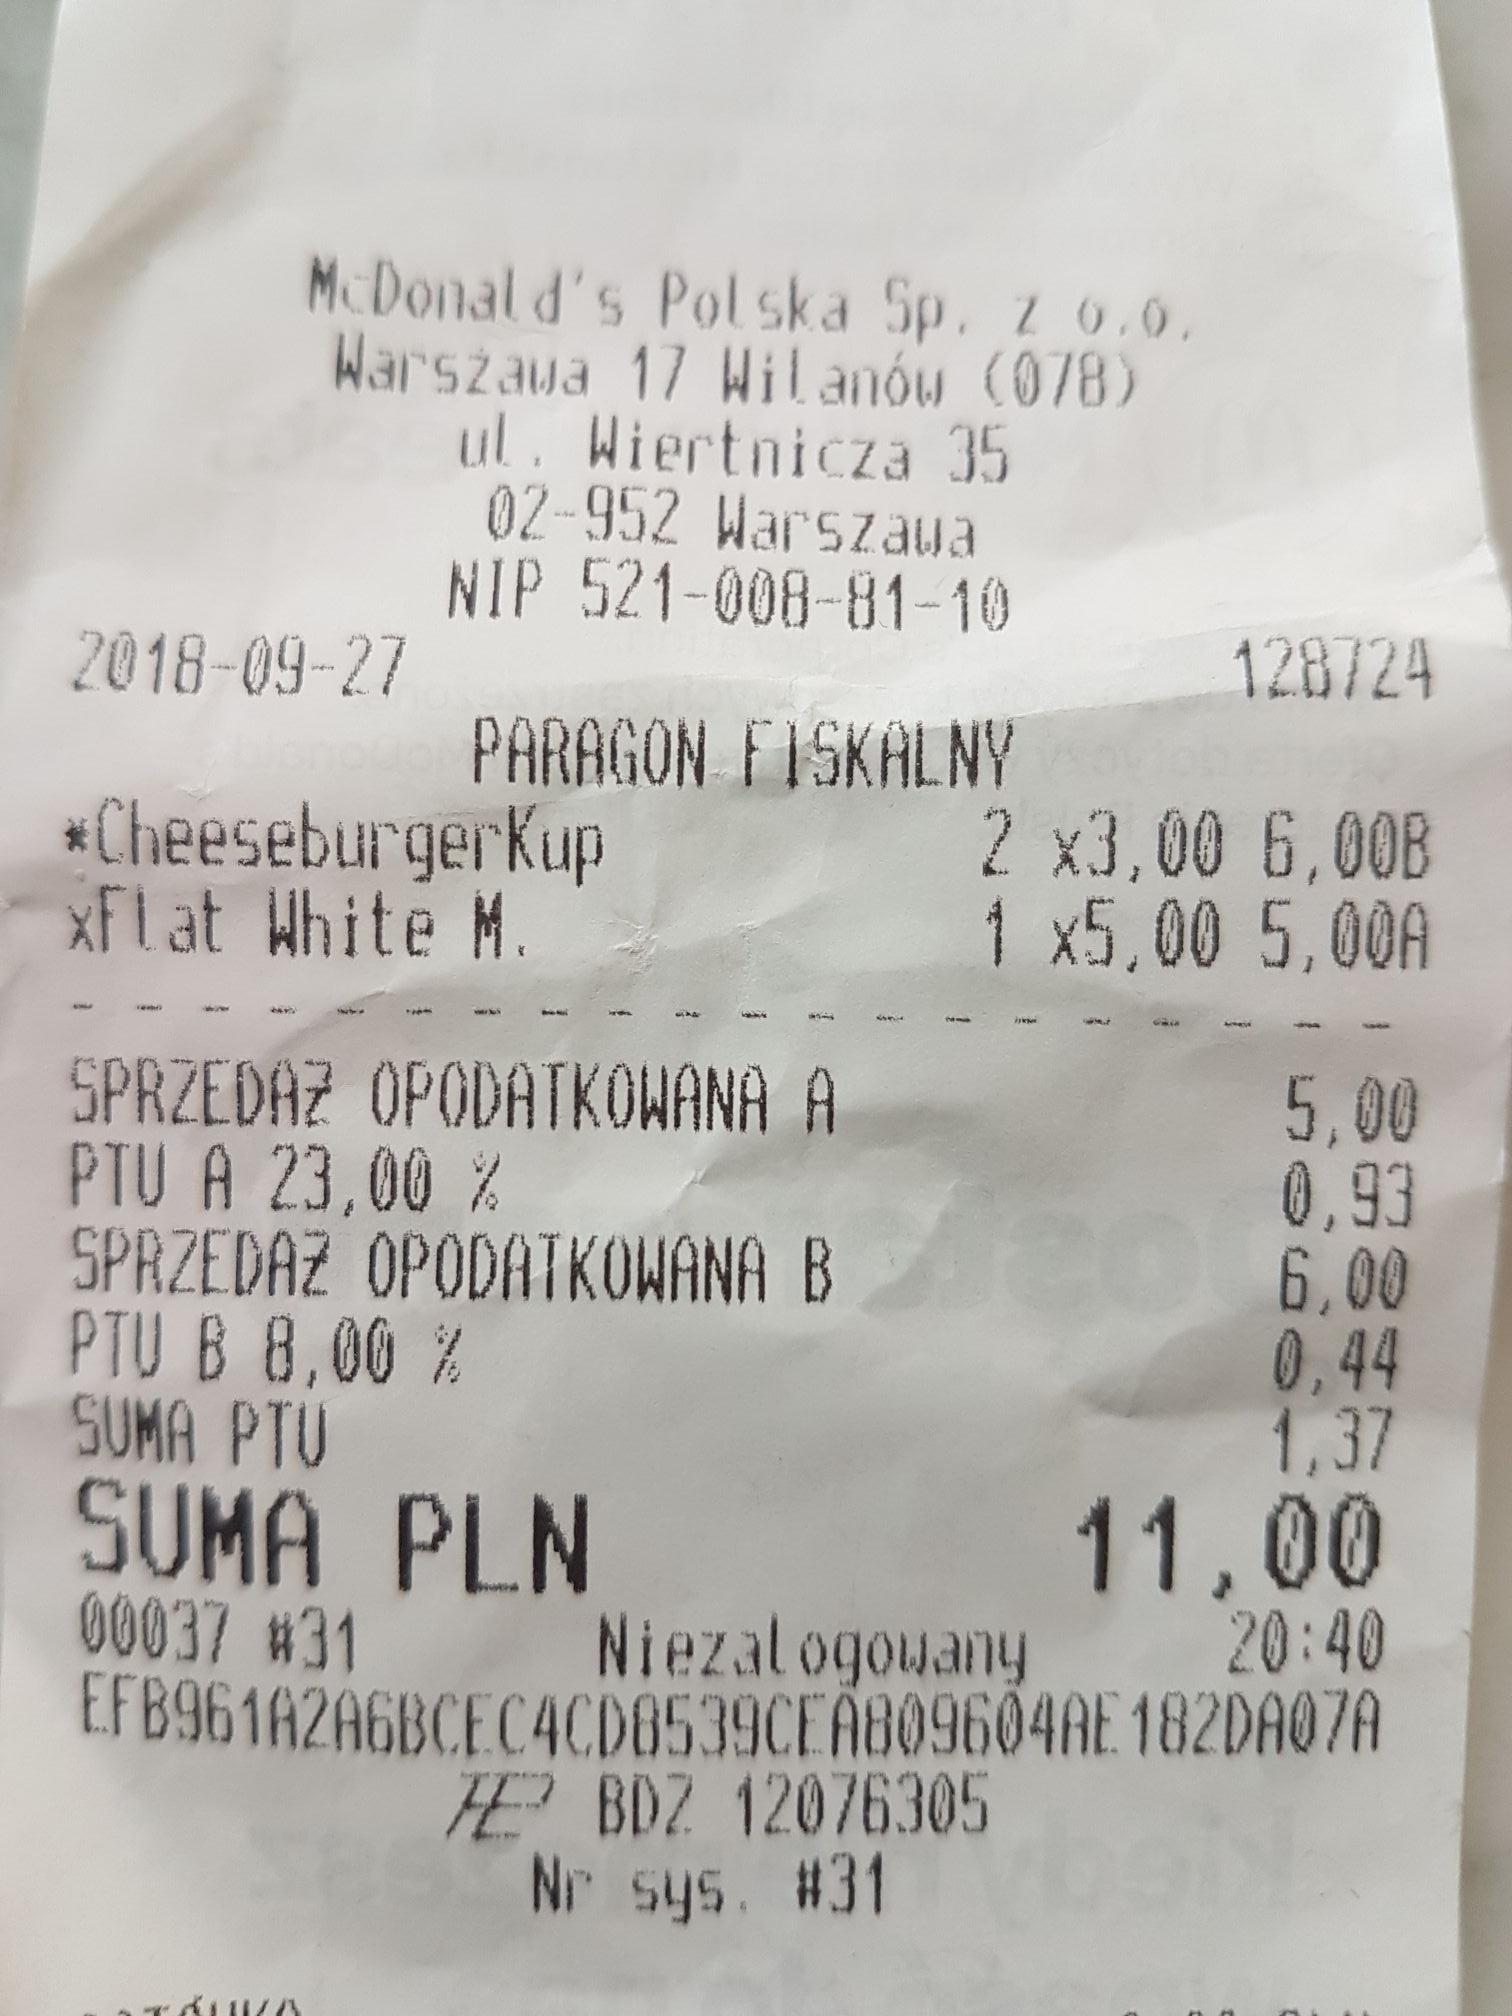 2 cheesburgery w McDonalds za 6 PLN